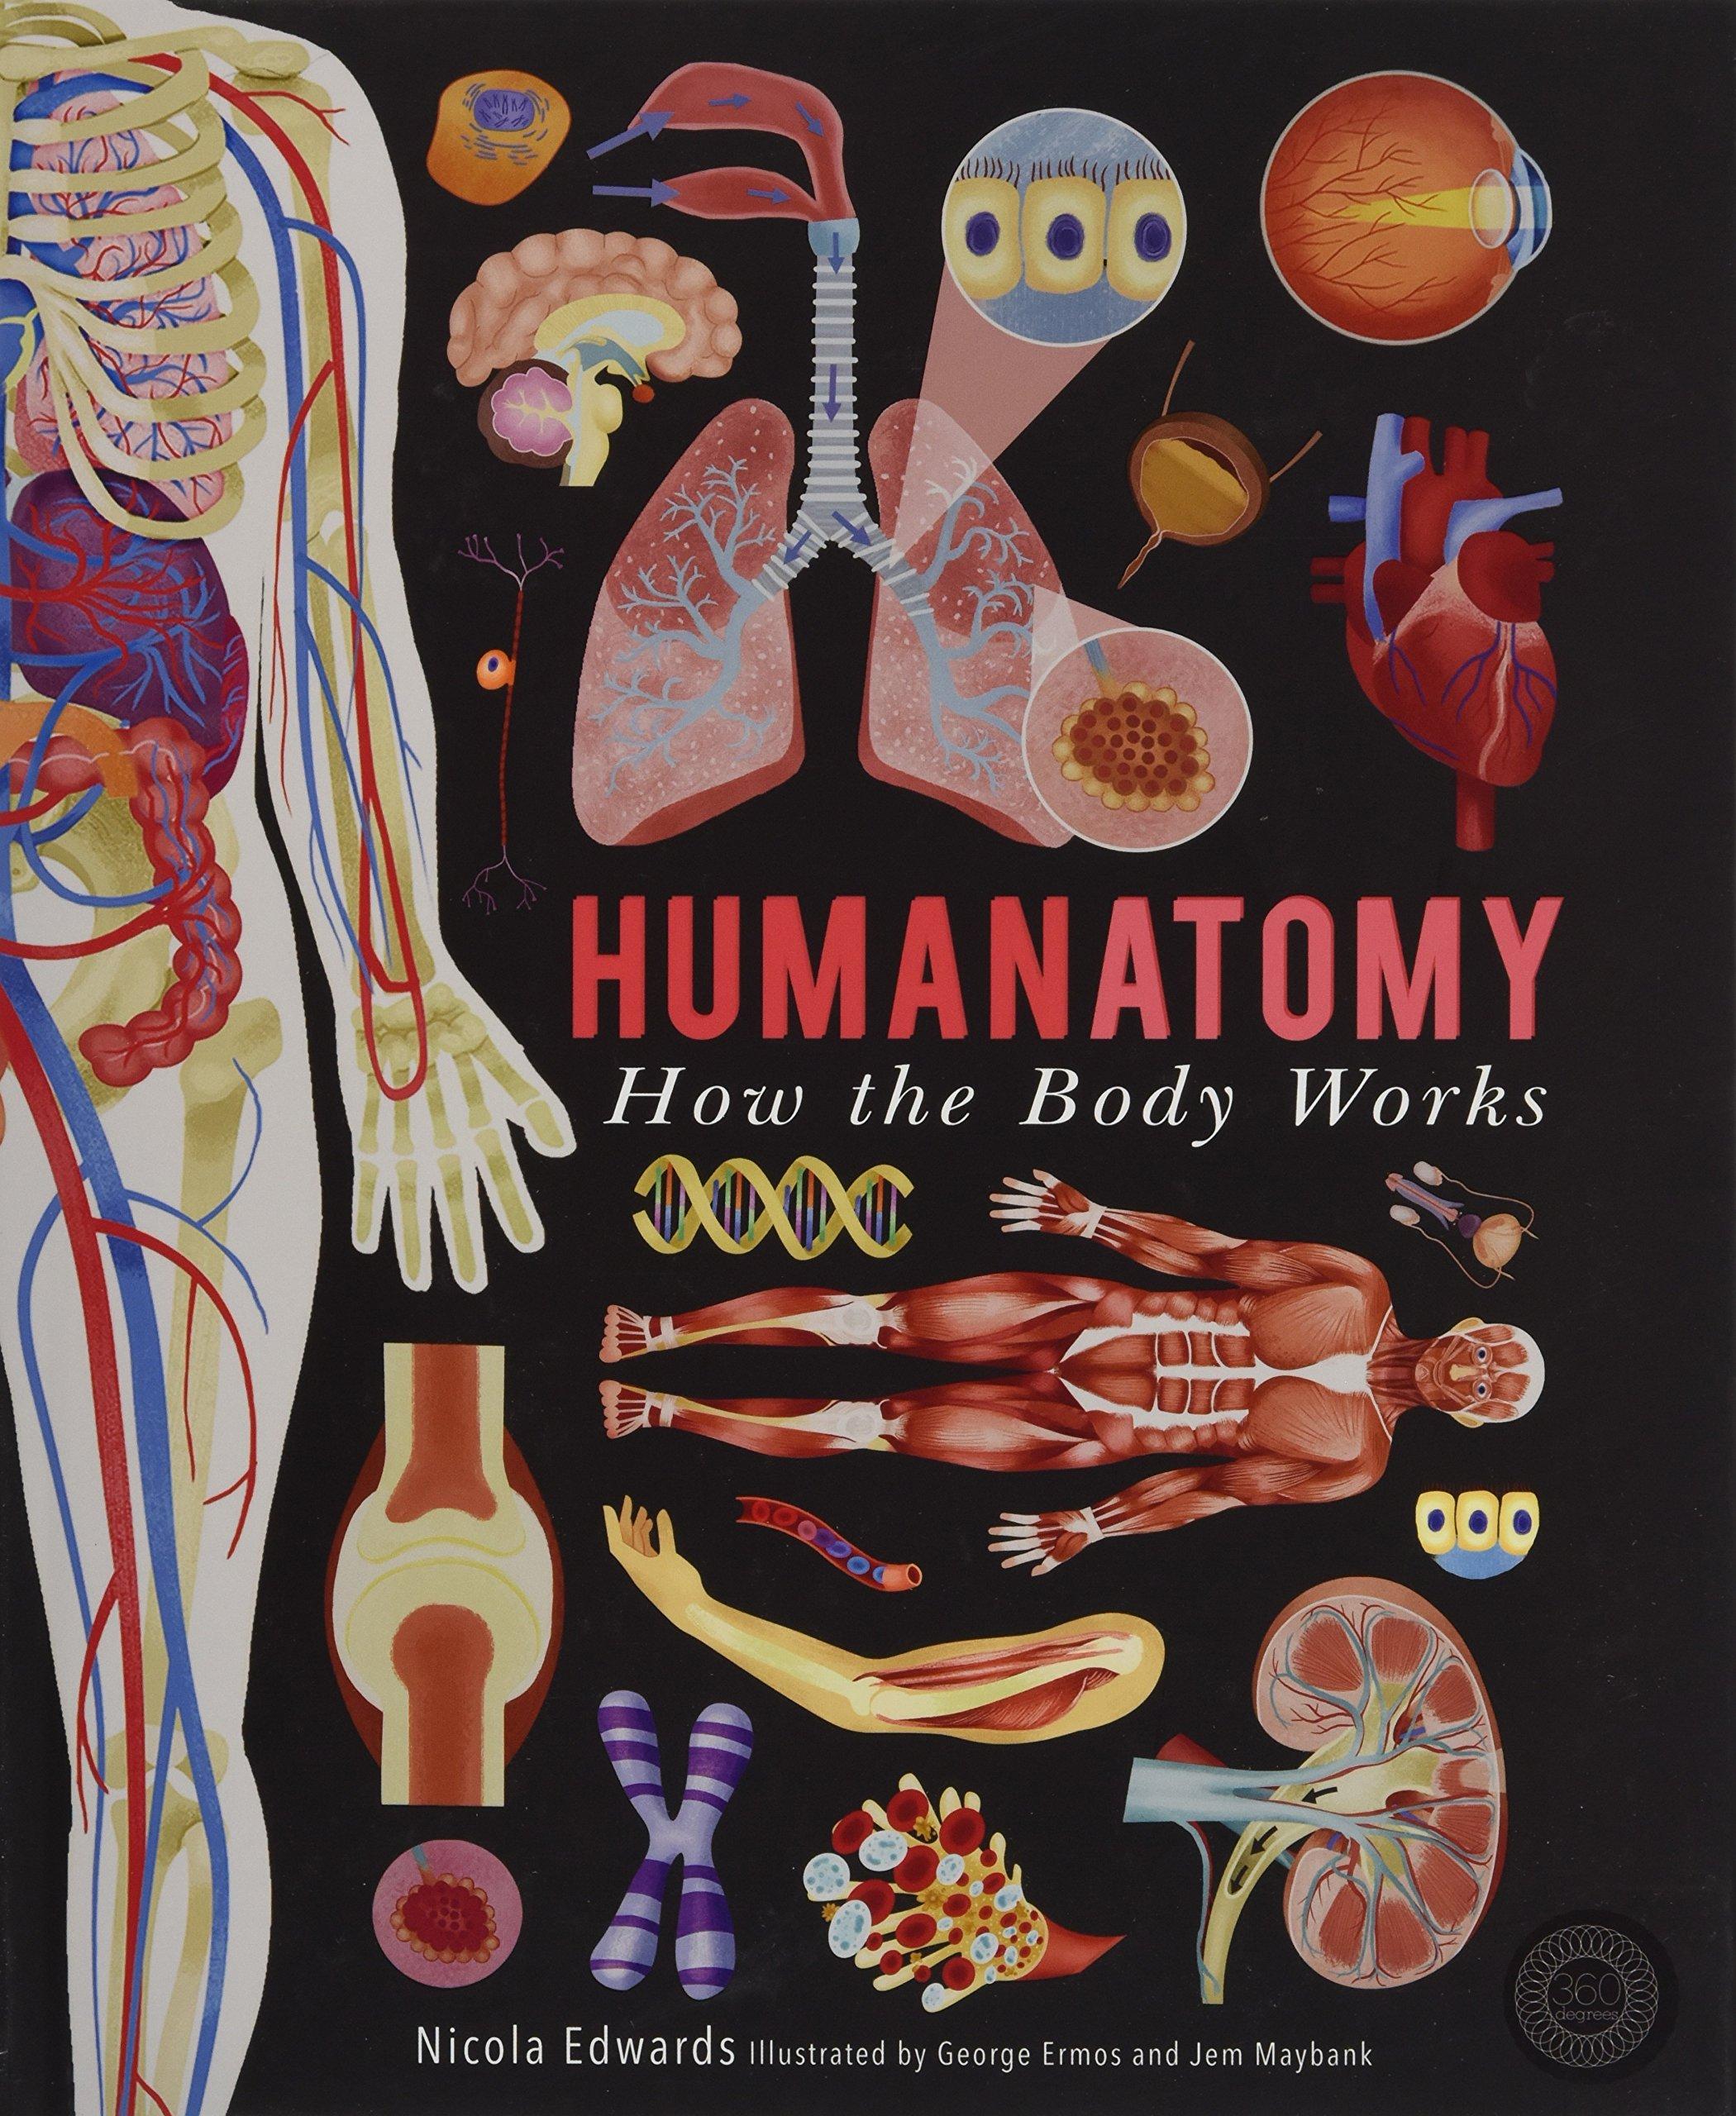 Humanatomy: How the Body Works: Amazon.co.uk: Nicola Edwards, Jem ...